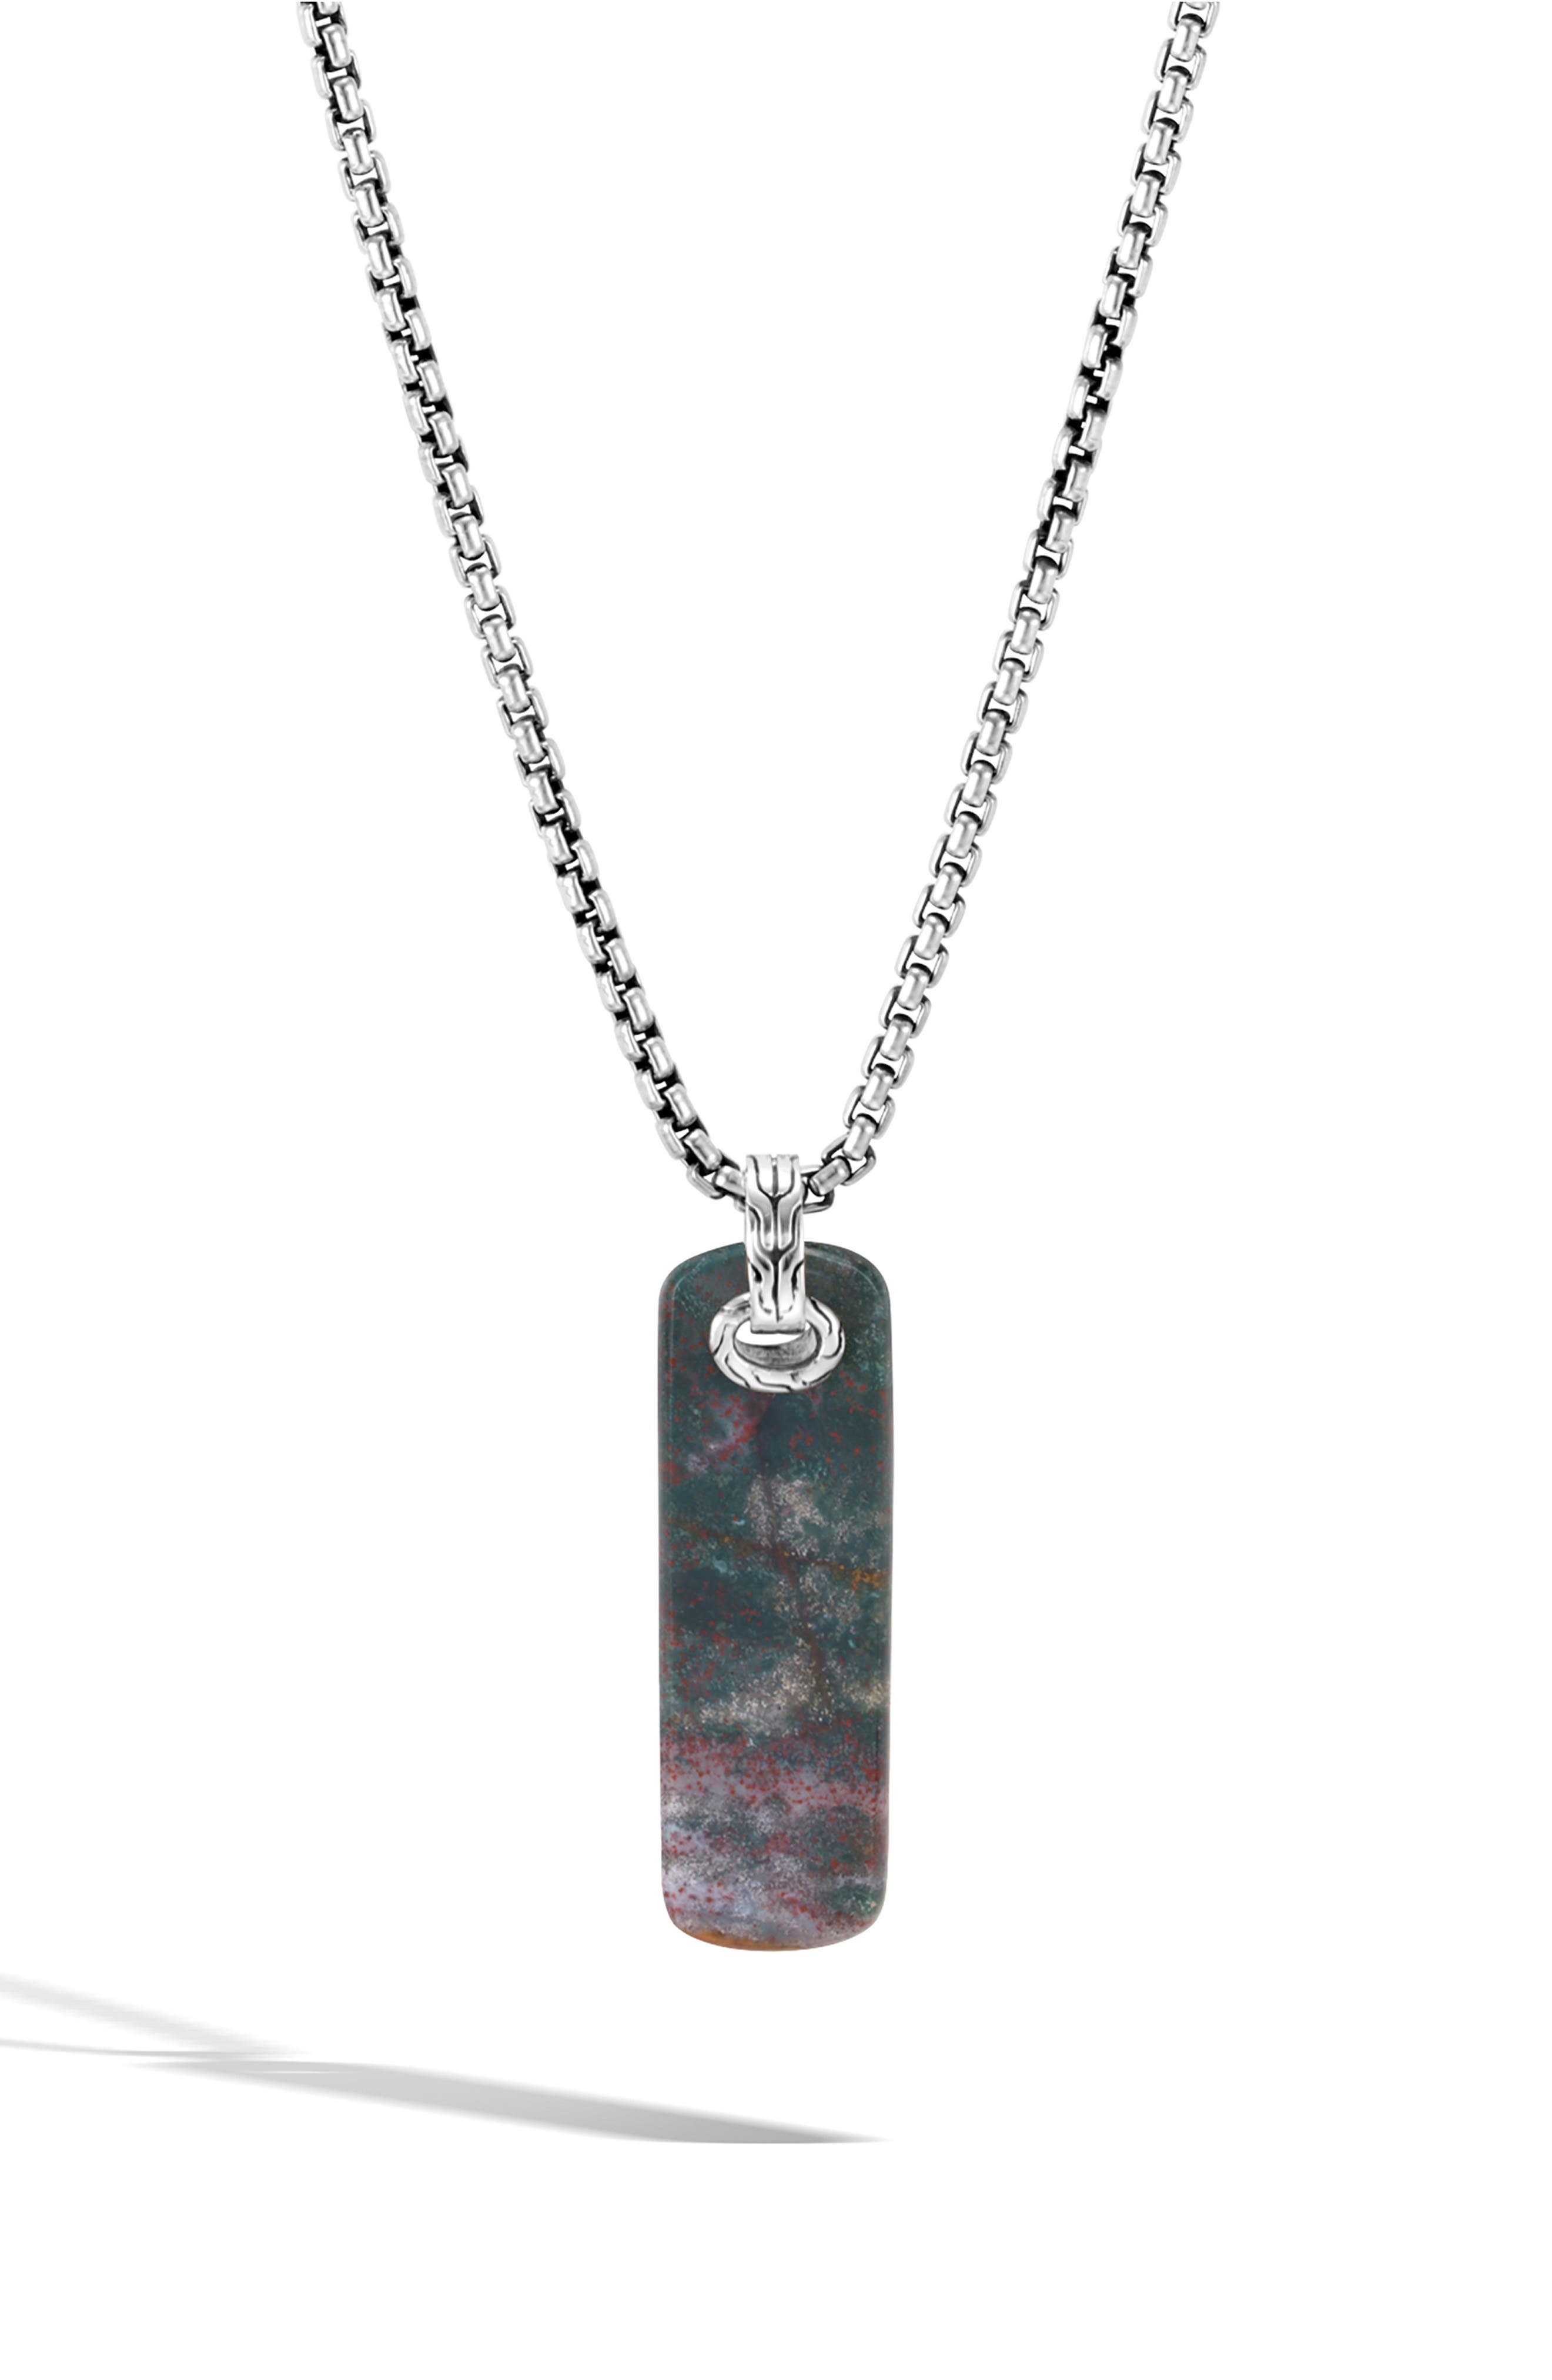 Men's Classic Chain Pendant Necklace,                         Main,                         color, SILVER/ DRAGON BLOOD JASPER